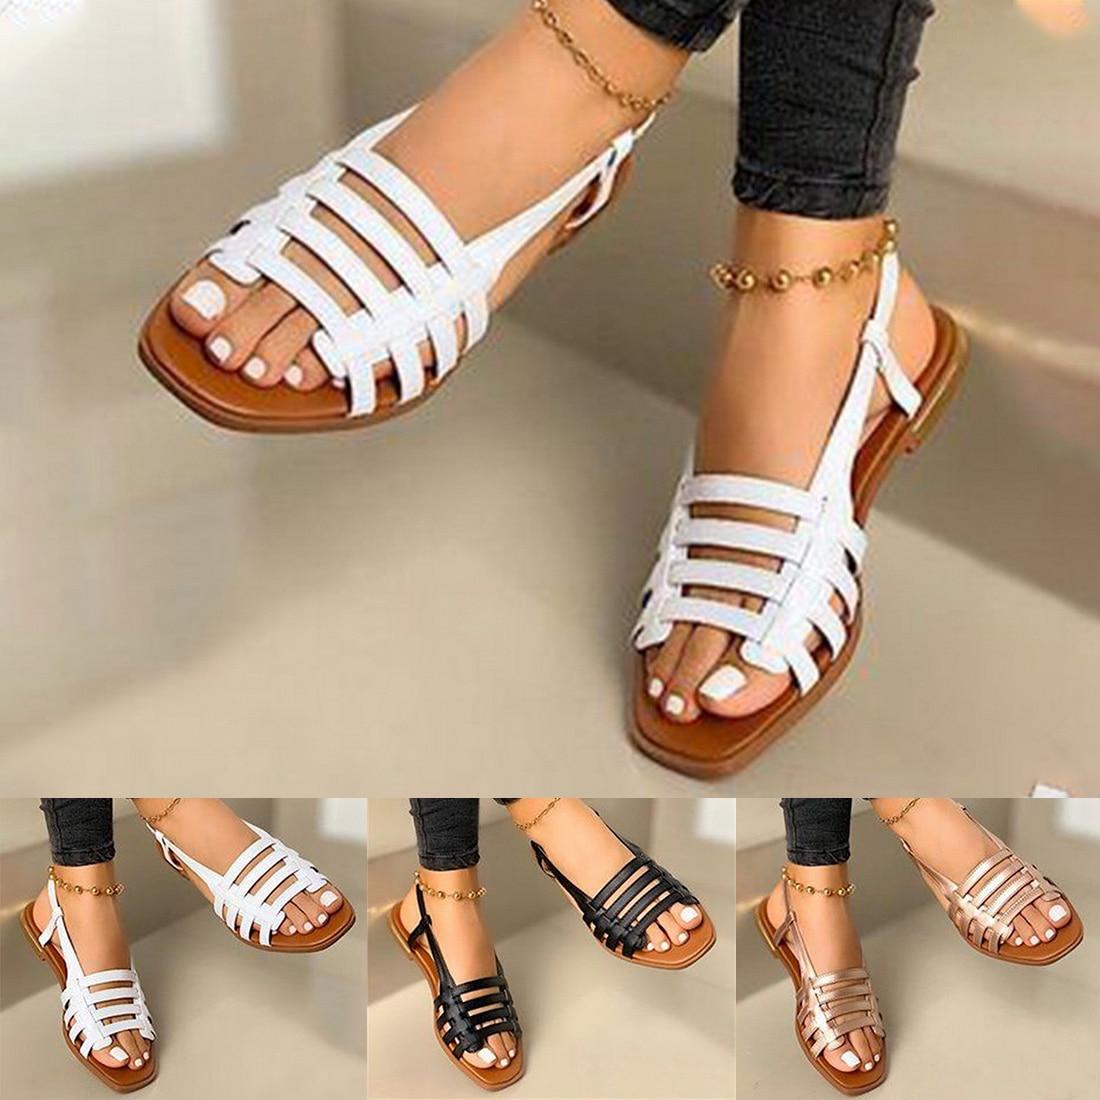 Flat Sandals Ladies Summer Outdoor Fashion Leather Flat Shoes Round Toe Elegent Slipper Adjustable B